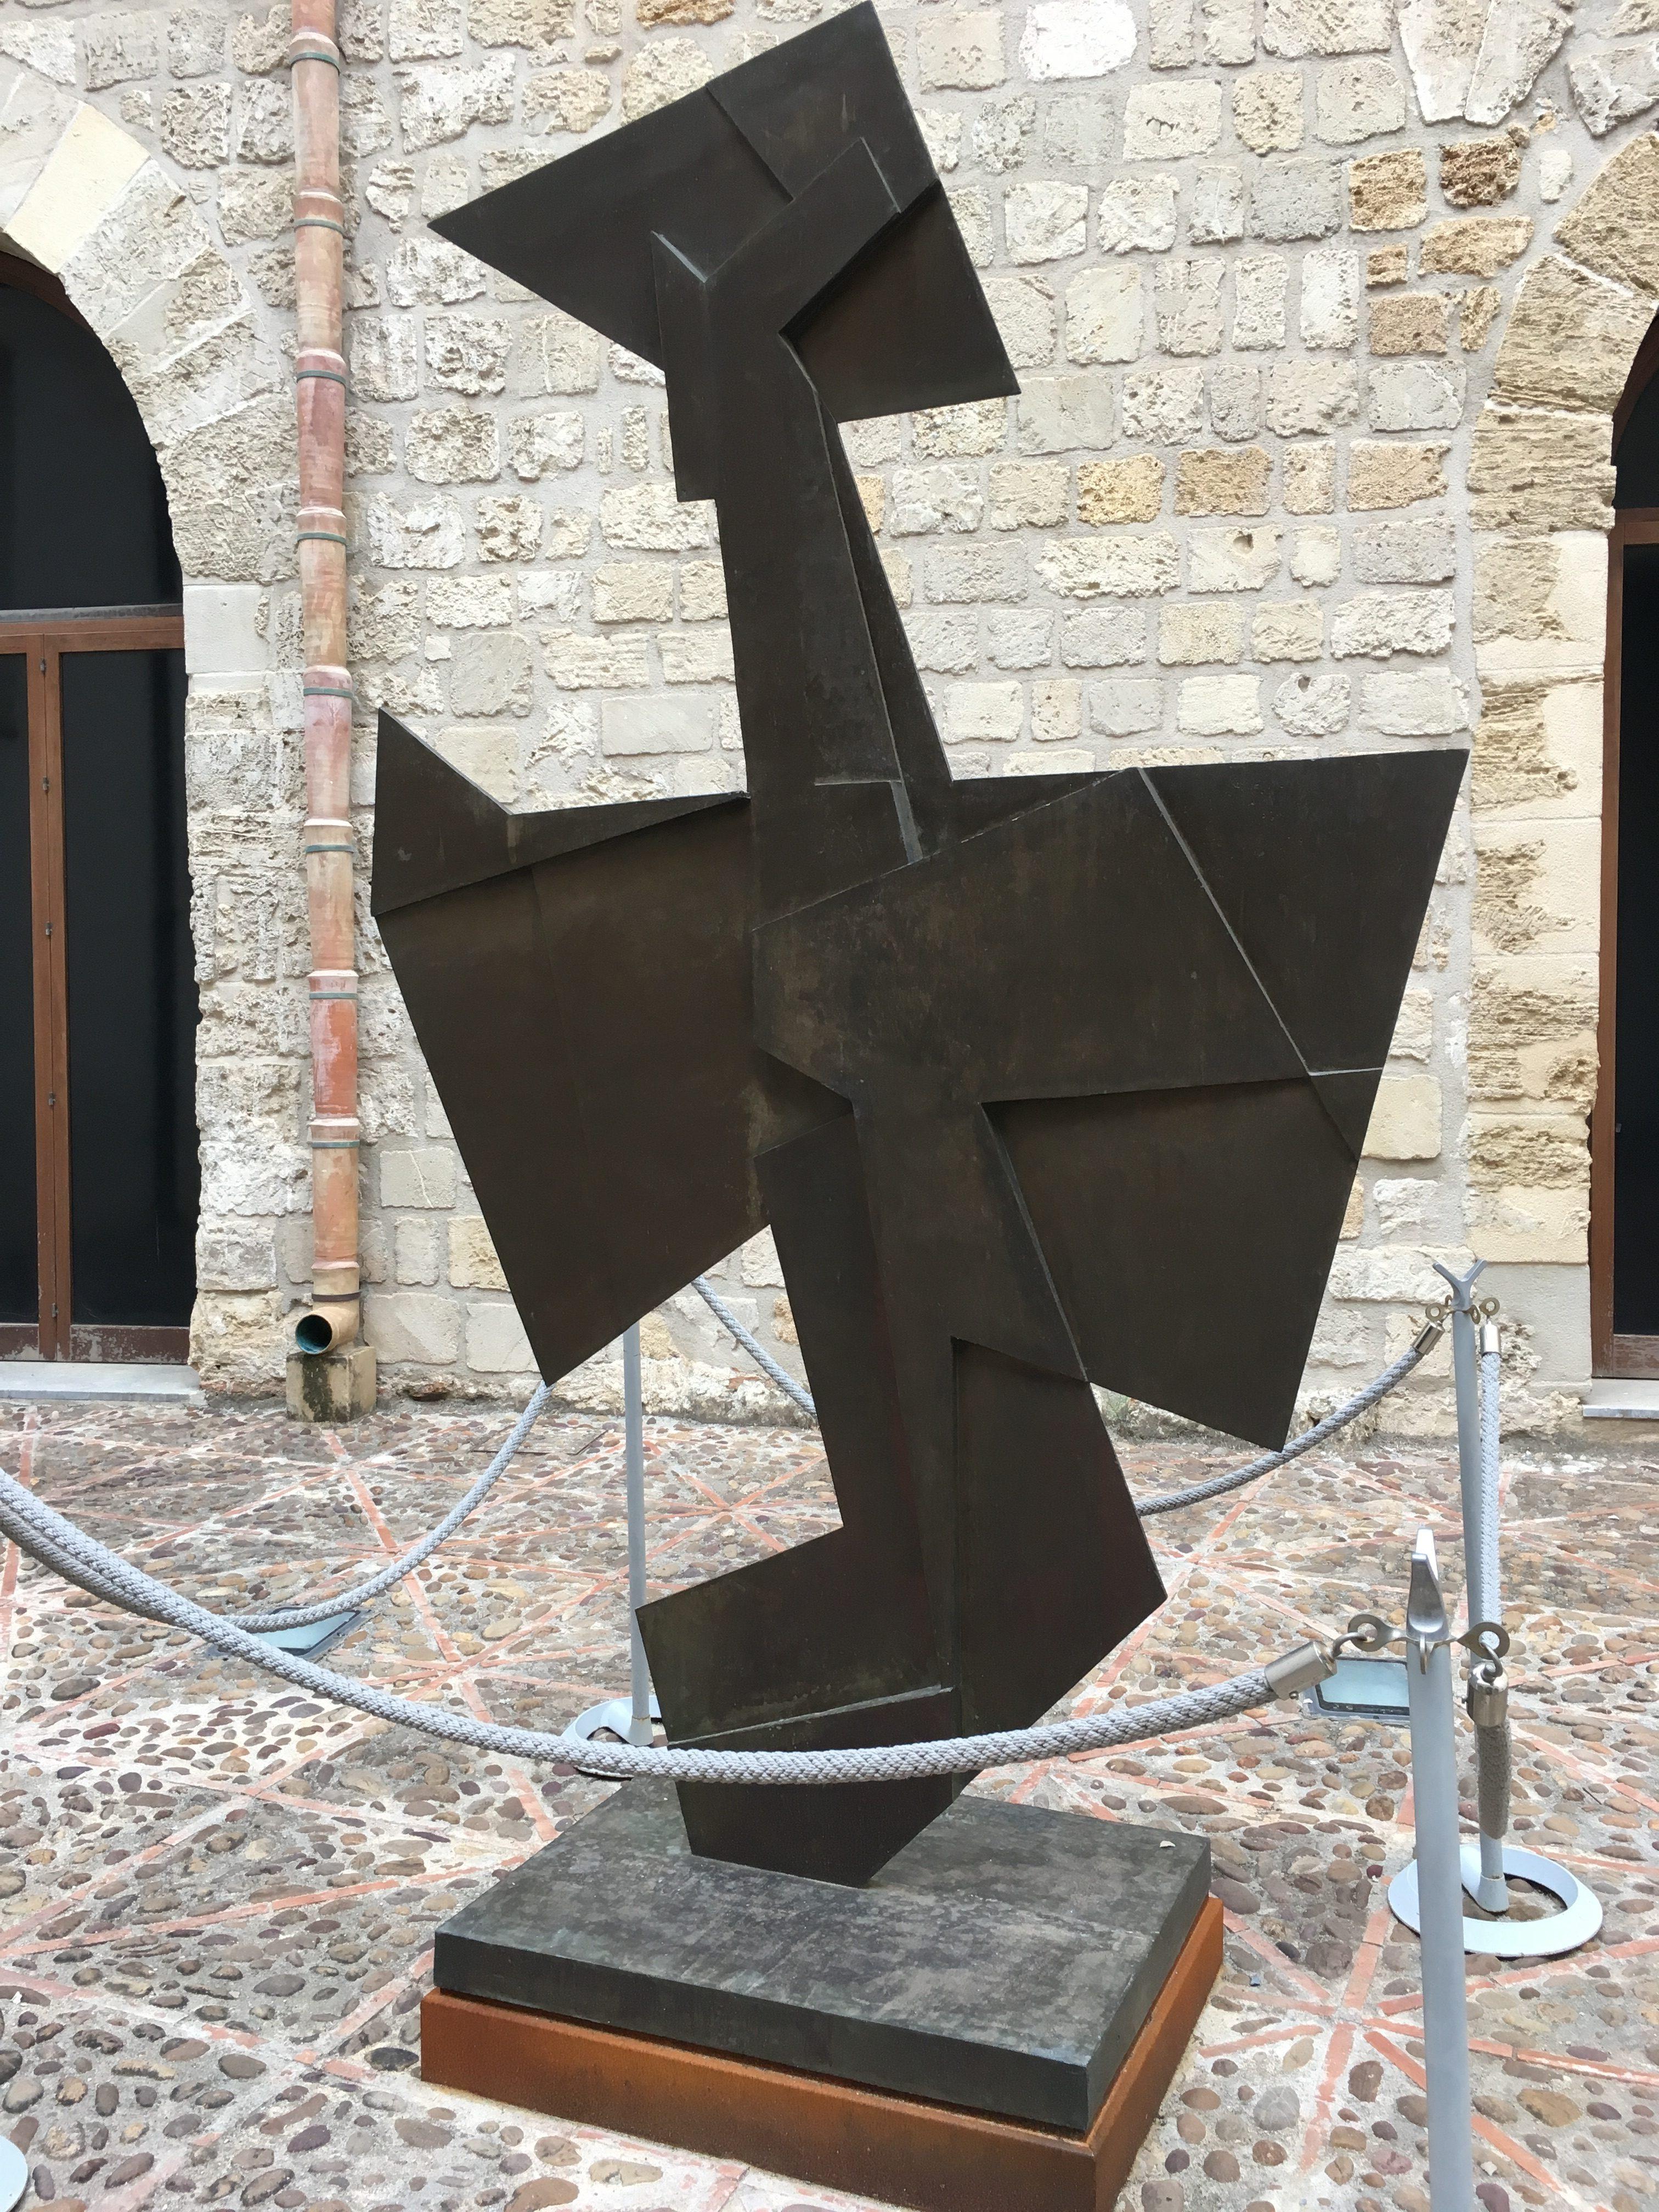 Pietro Consagra, beeldhouwwerk. Foto Manuelarosi, 2016